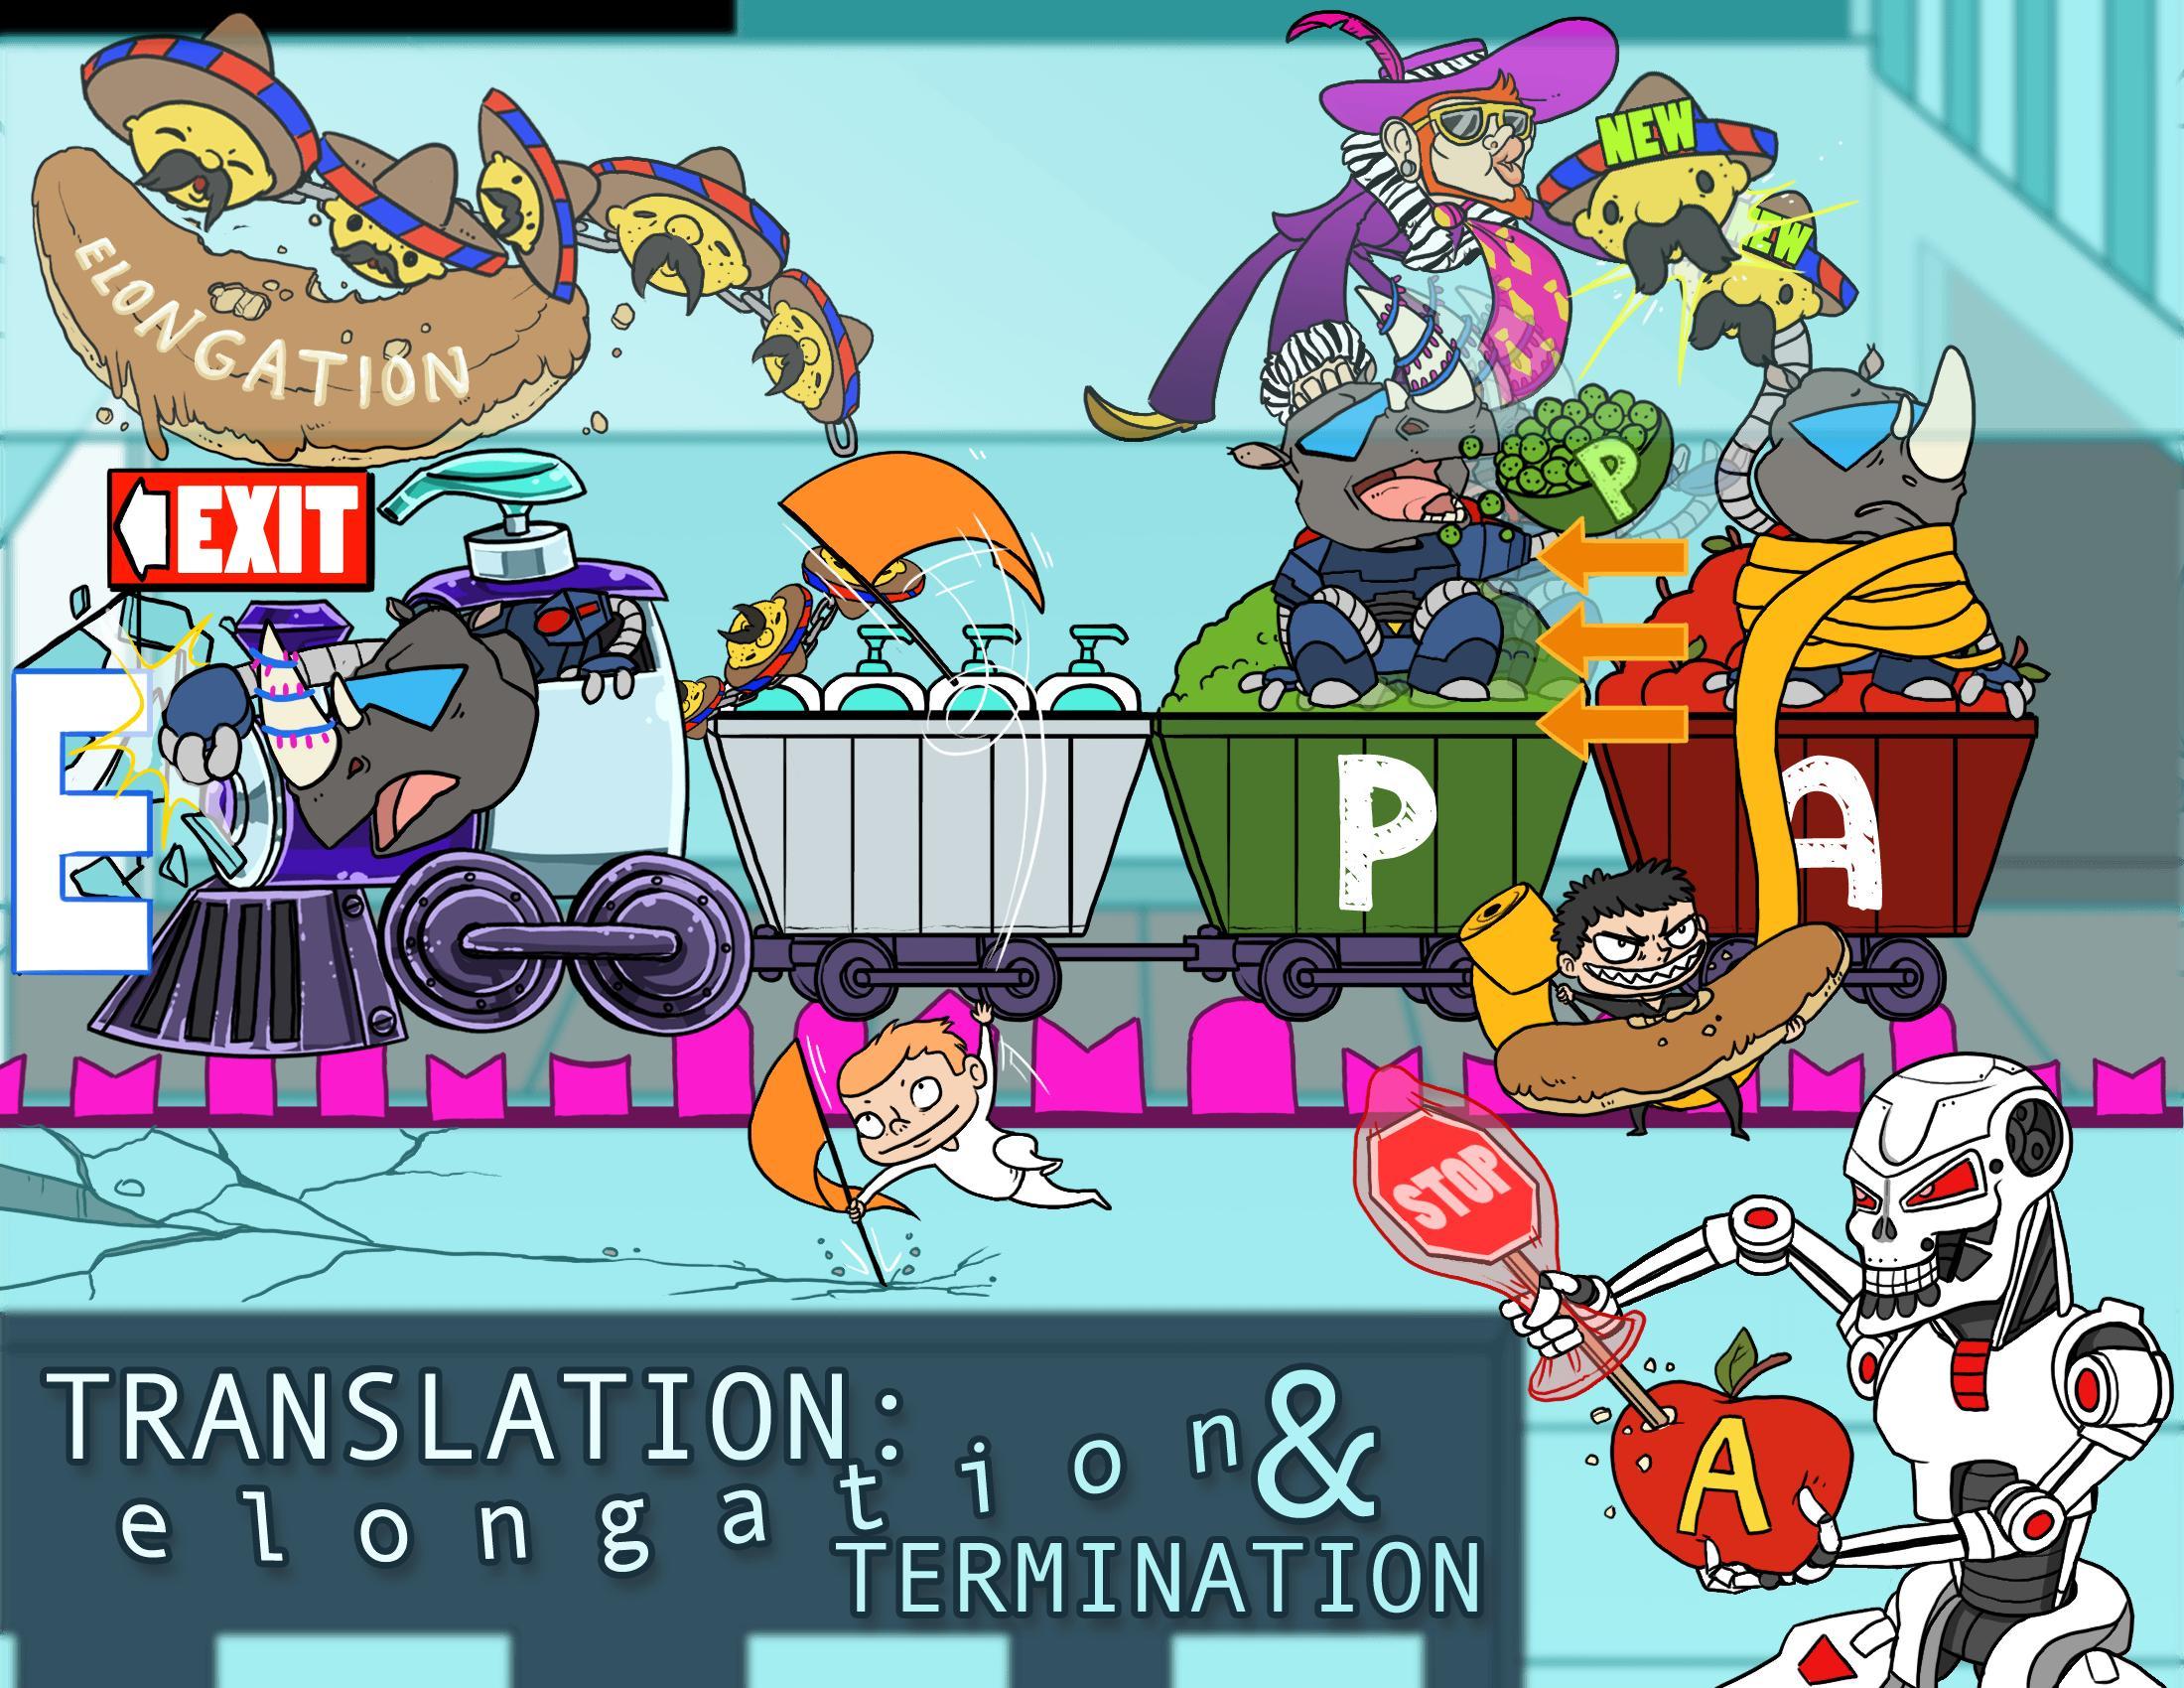 Translation: Elongation & Termination